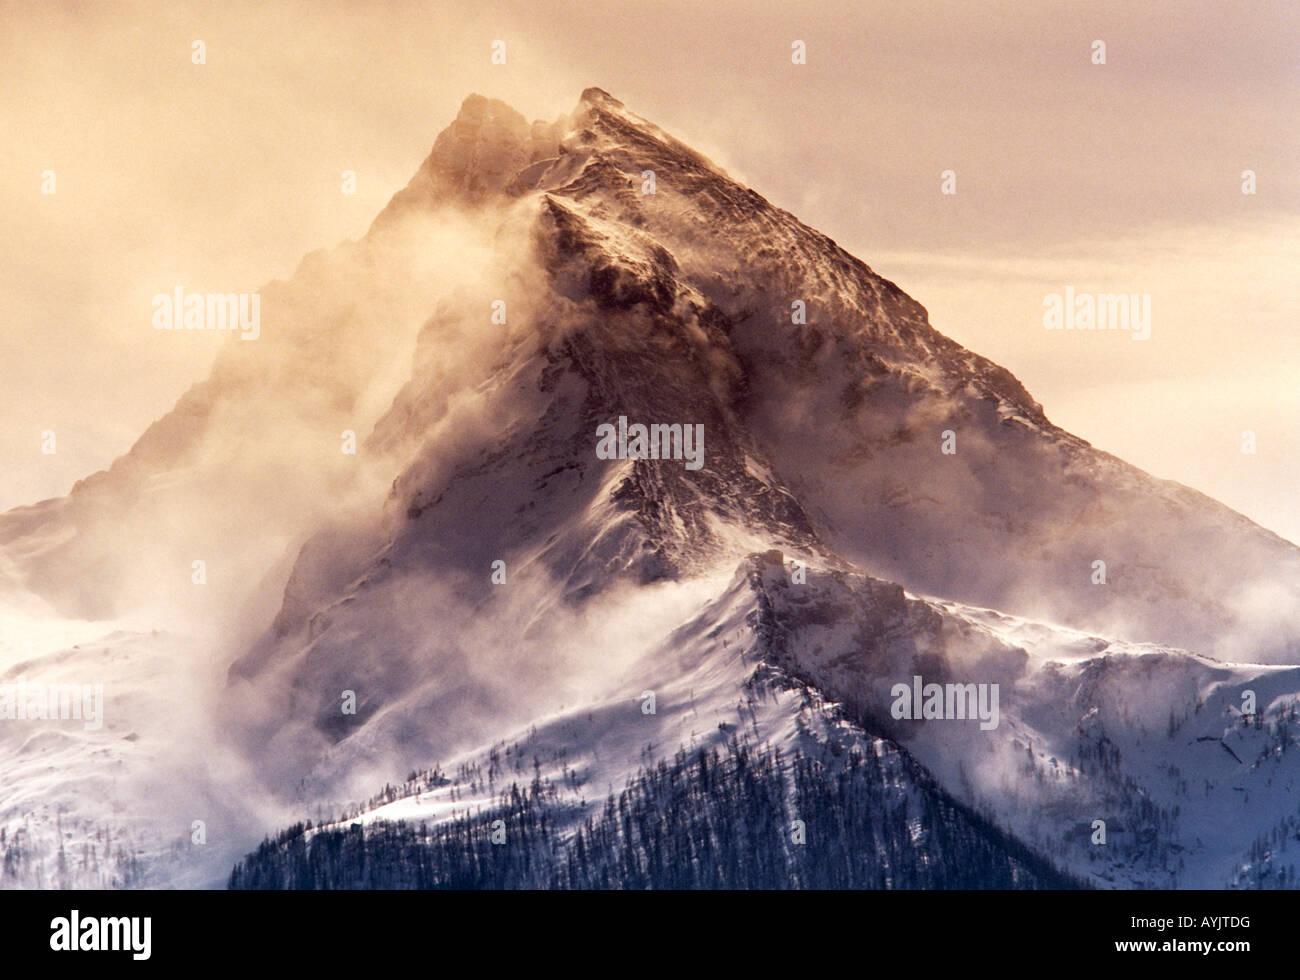 La montaña Watzmann (2713 m) en la tormenta de nieve Imagen De Stock